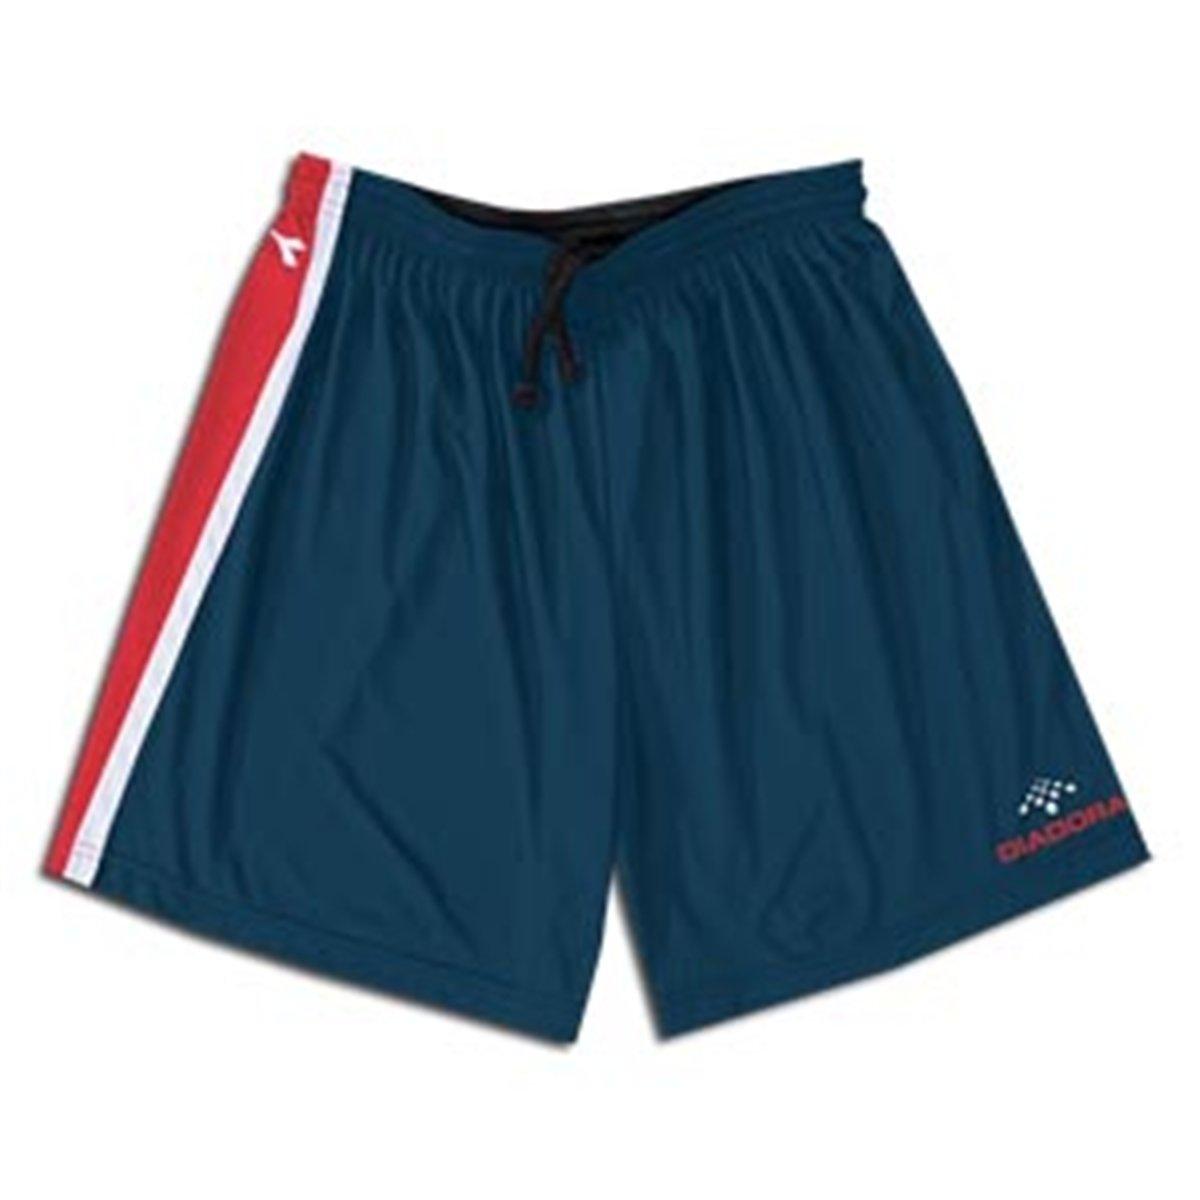 Diadora Serie A Soccer Shorts ( SN ) B000LQVFTI S|Navy / Red /White Navy / Red /White S